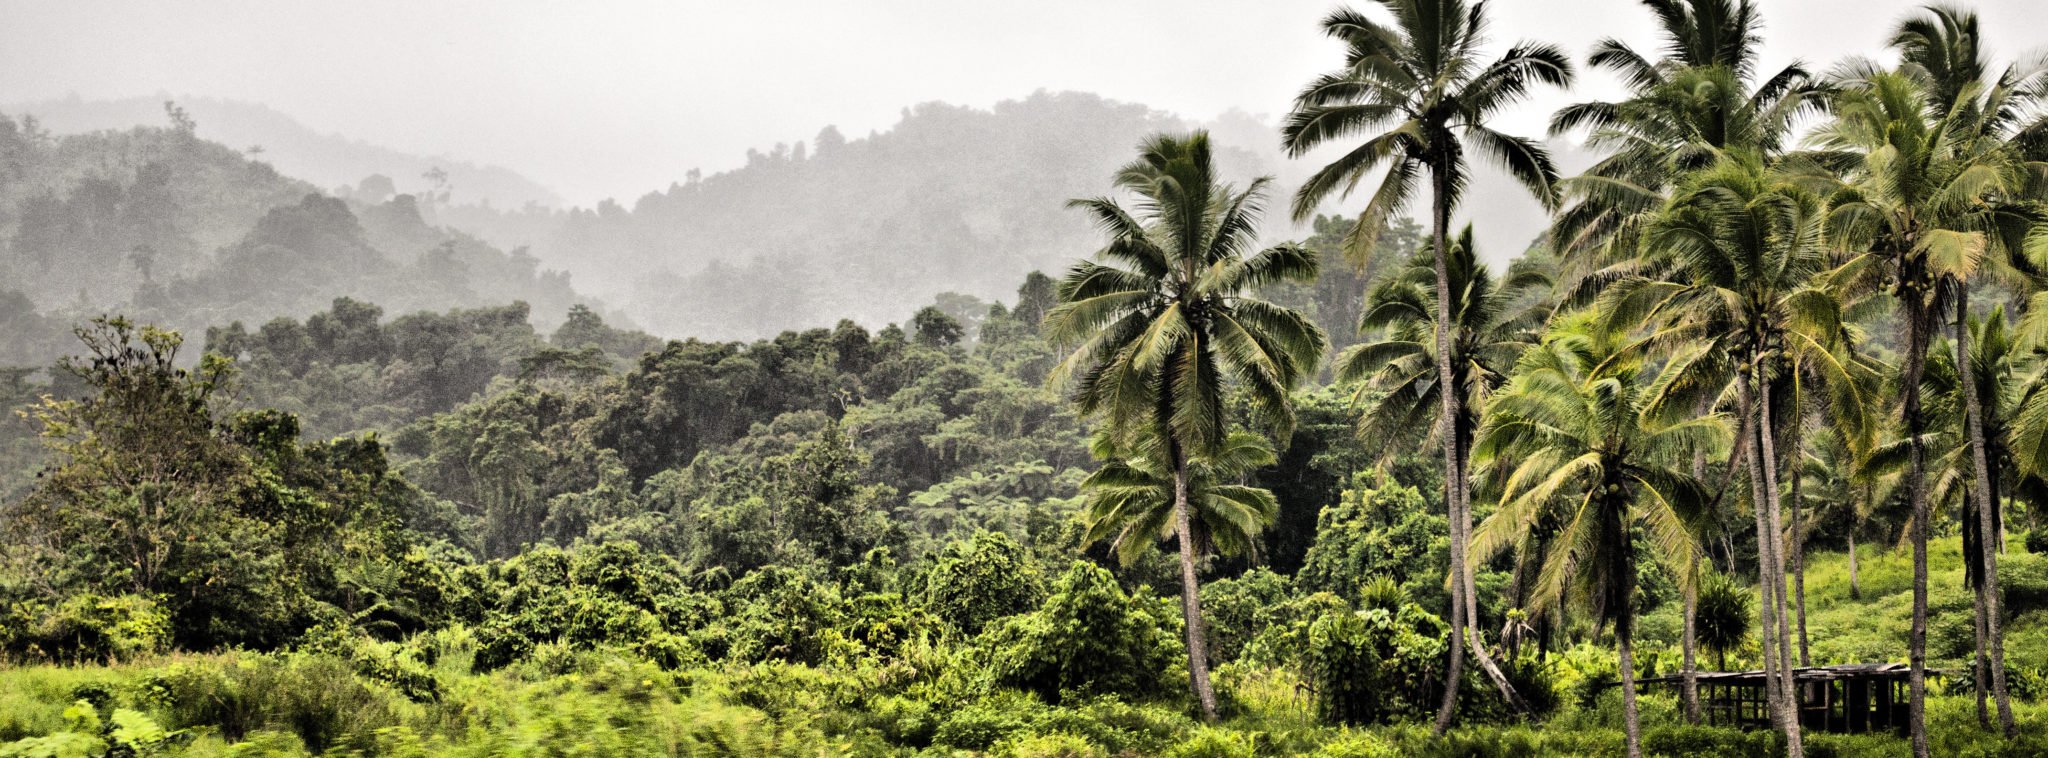 Fidschi-Inseln-Palmen